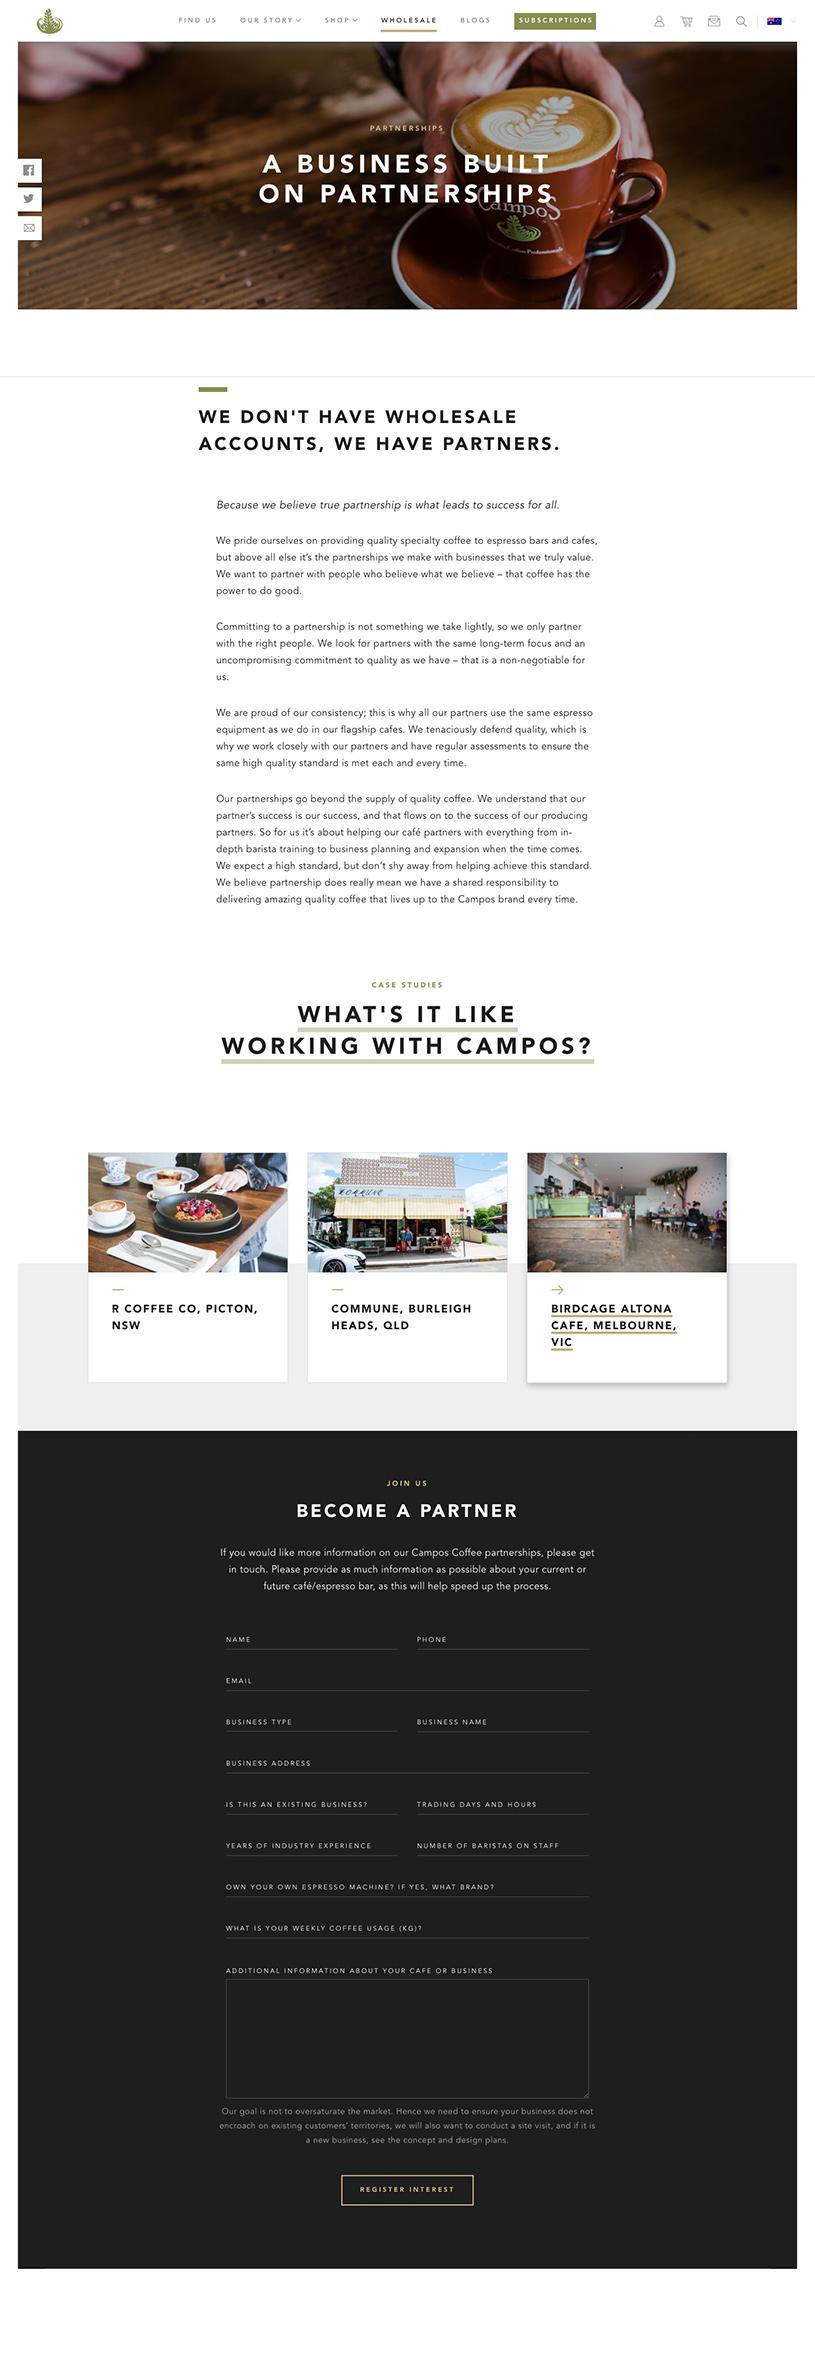 Campos Coffee Wholesale Partner Page